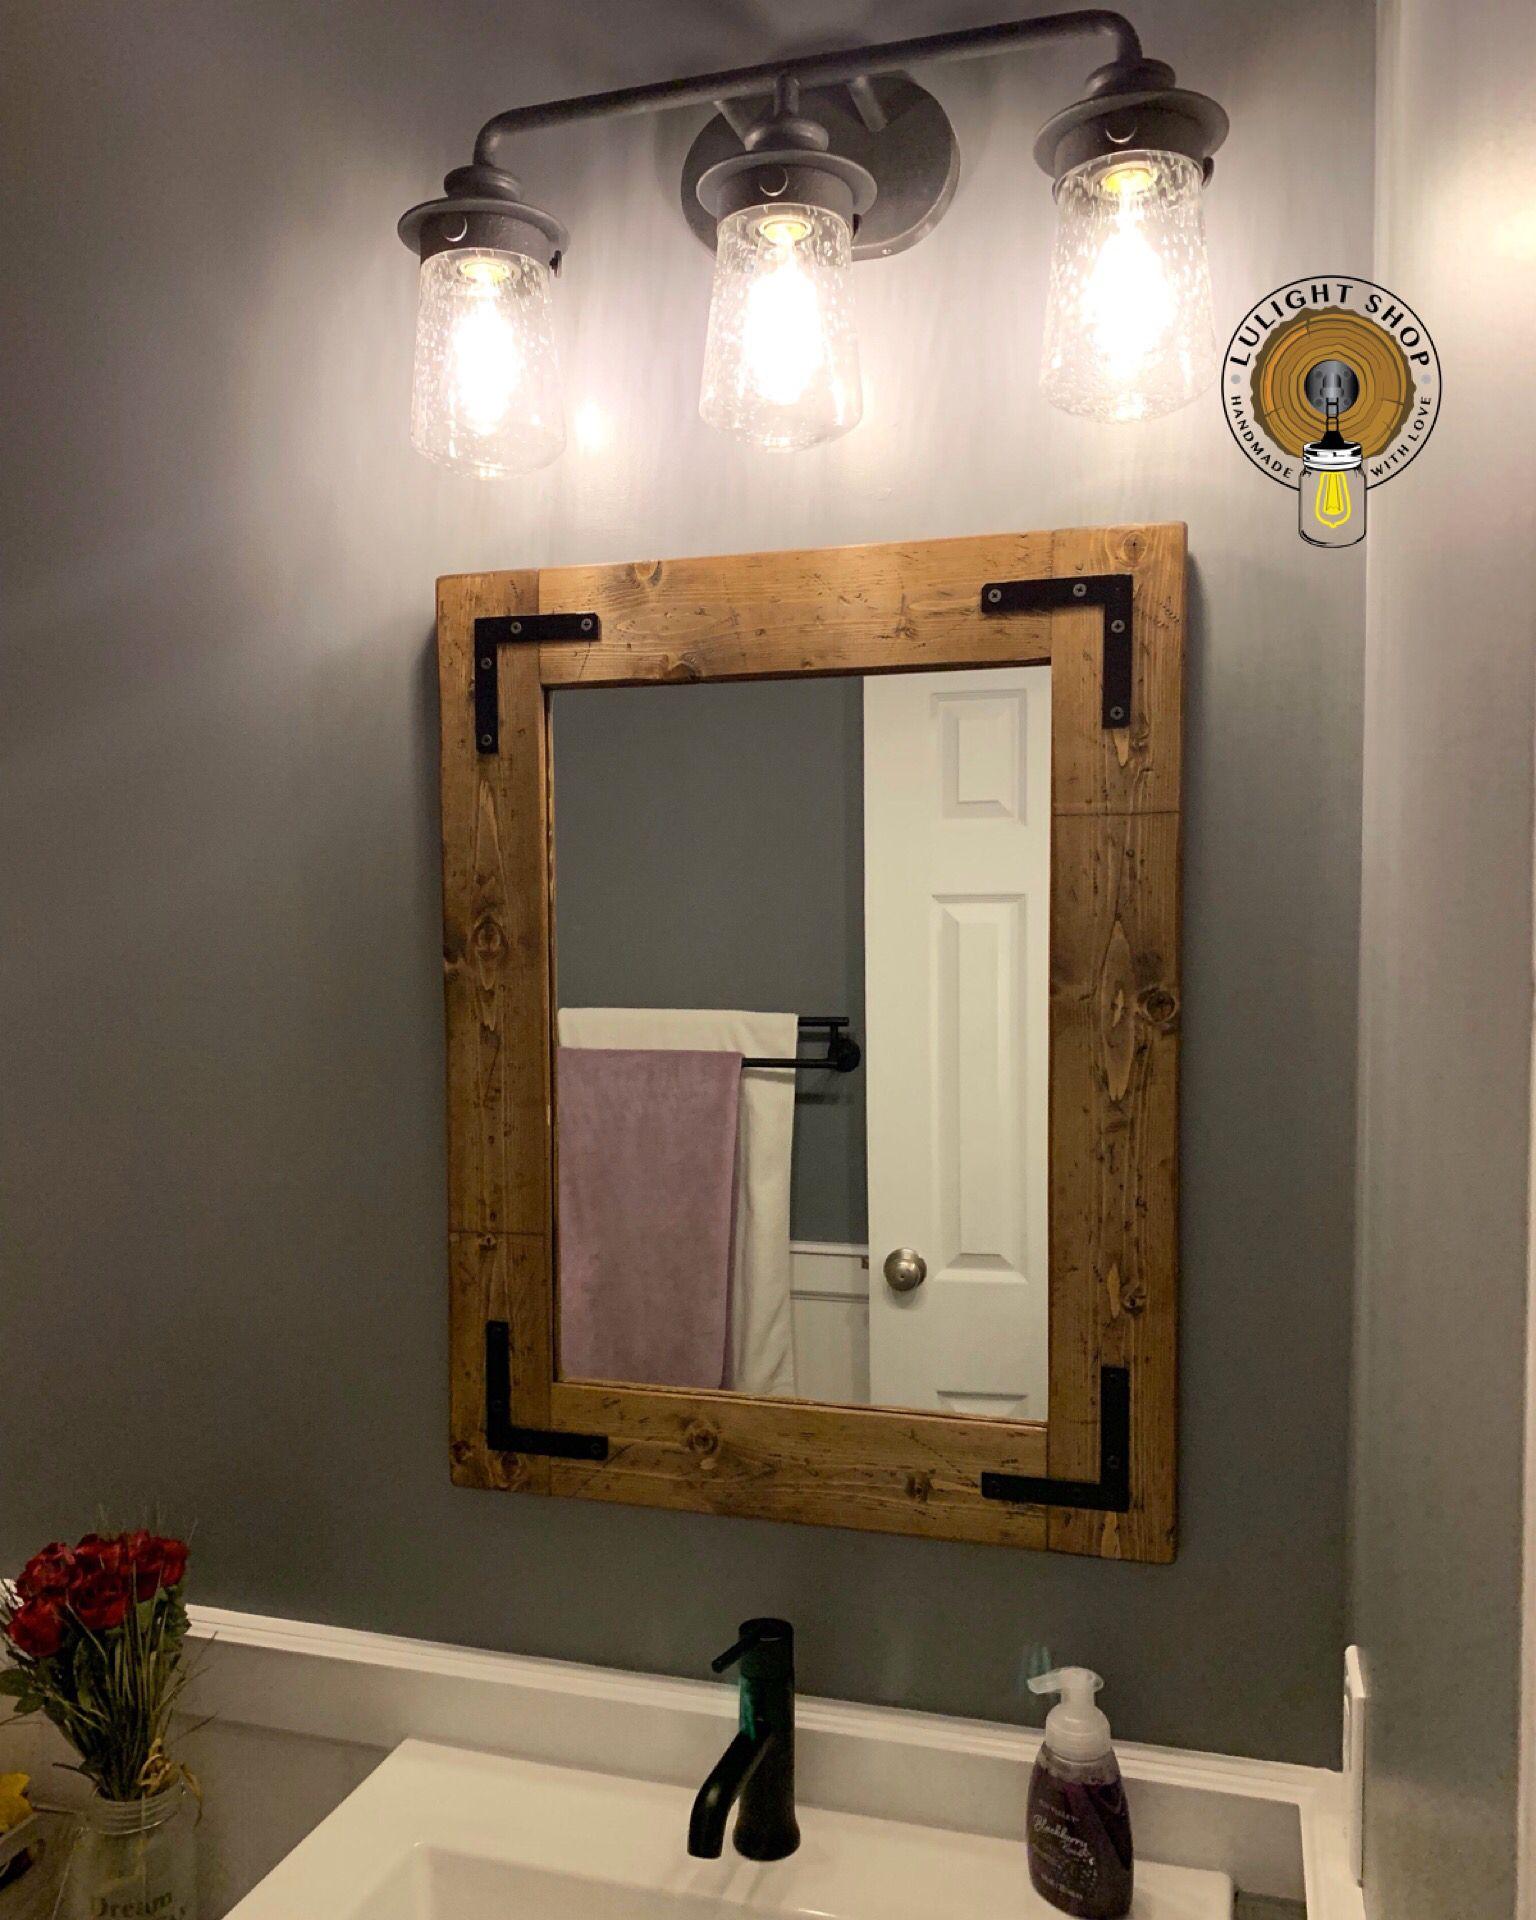 Handmade Farmhouse Rustic Lighting And Home Decor By Lulight Rustic Bathroom Lighting Rustic Bathroom Light Fixtures Bathroom Mirror